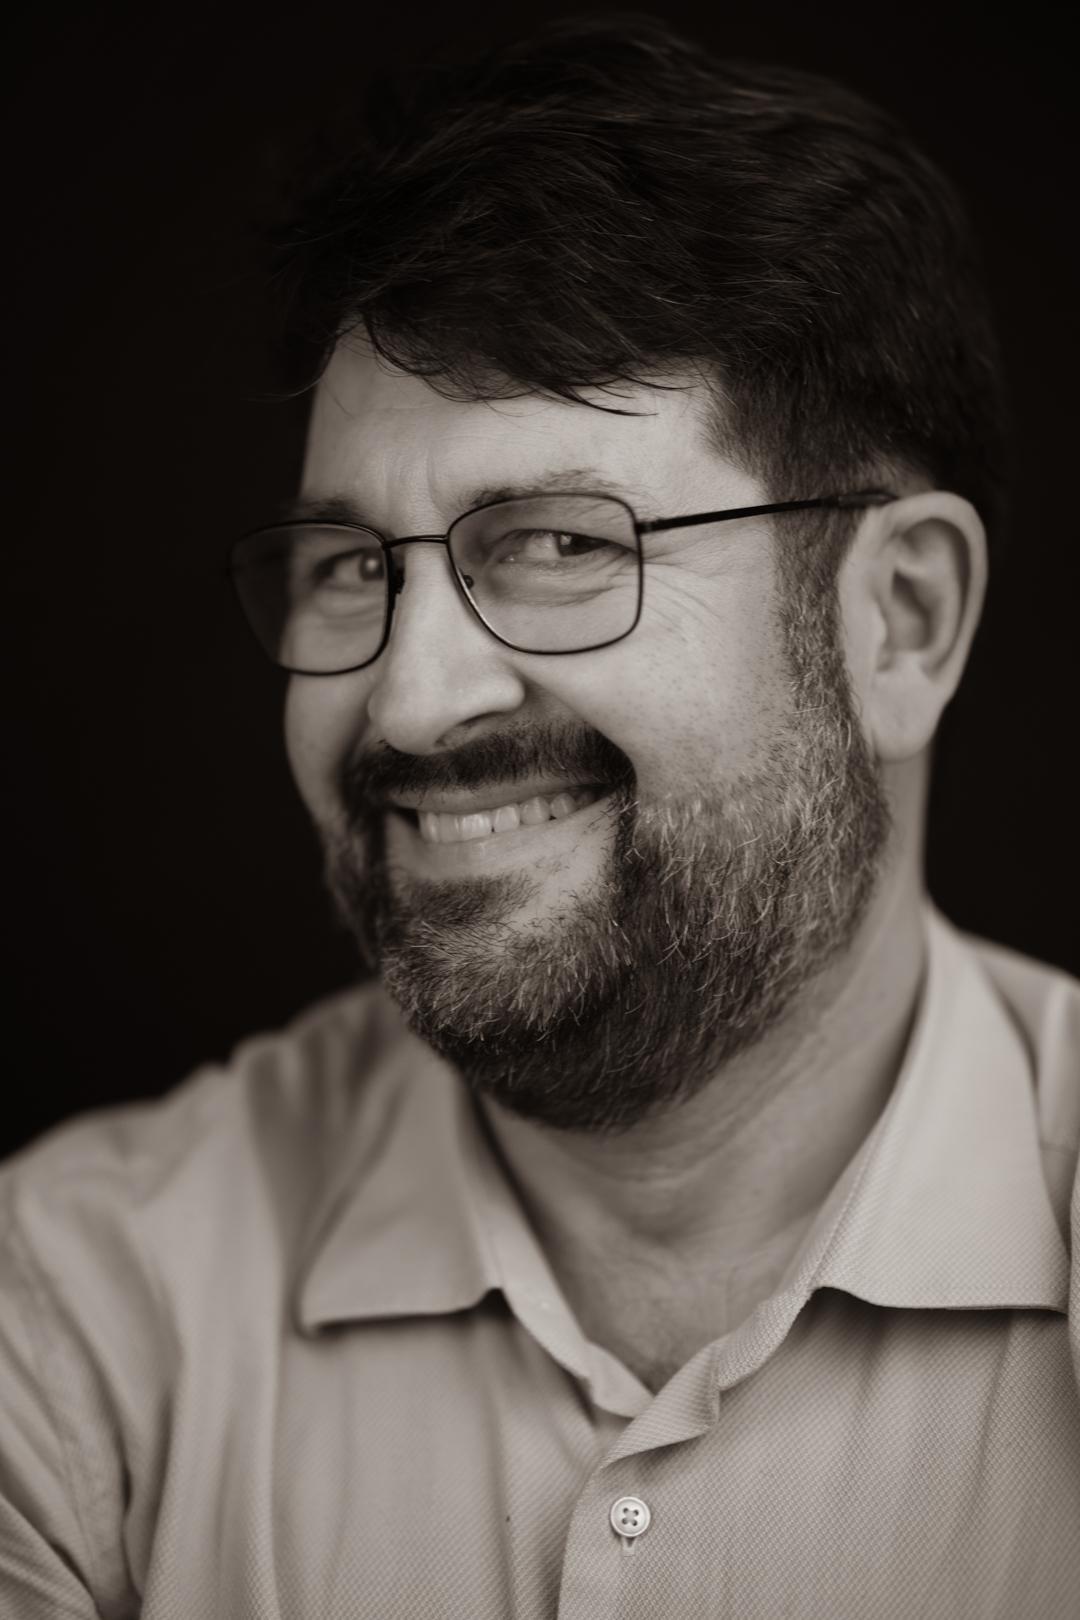 Gian Luca Pallai